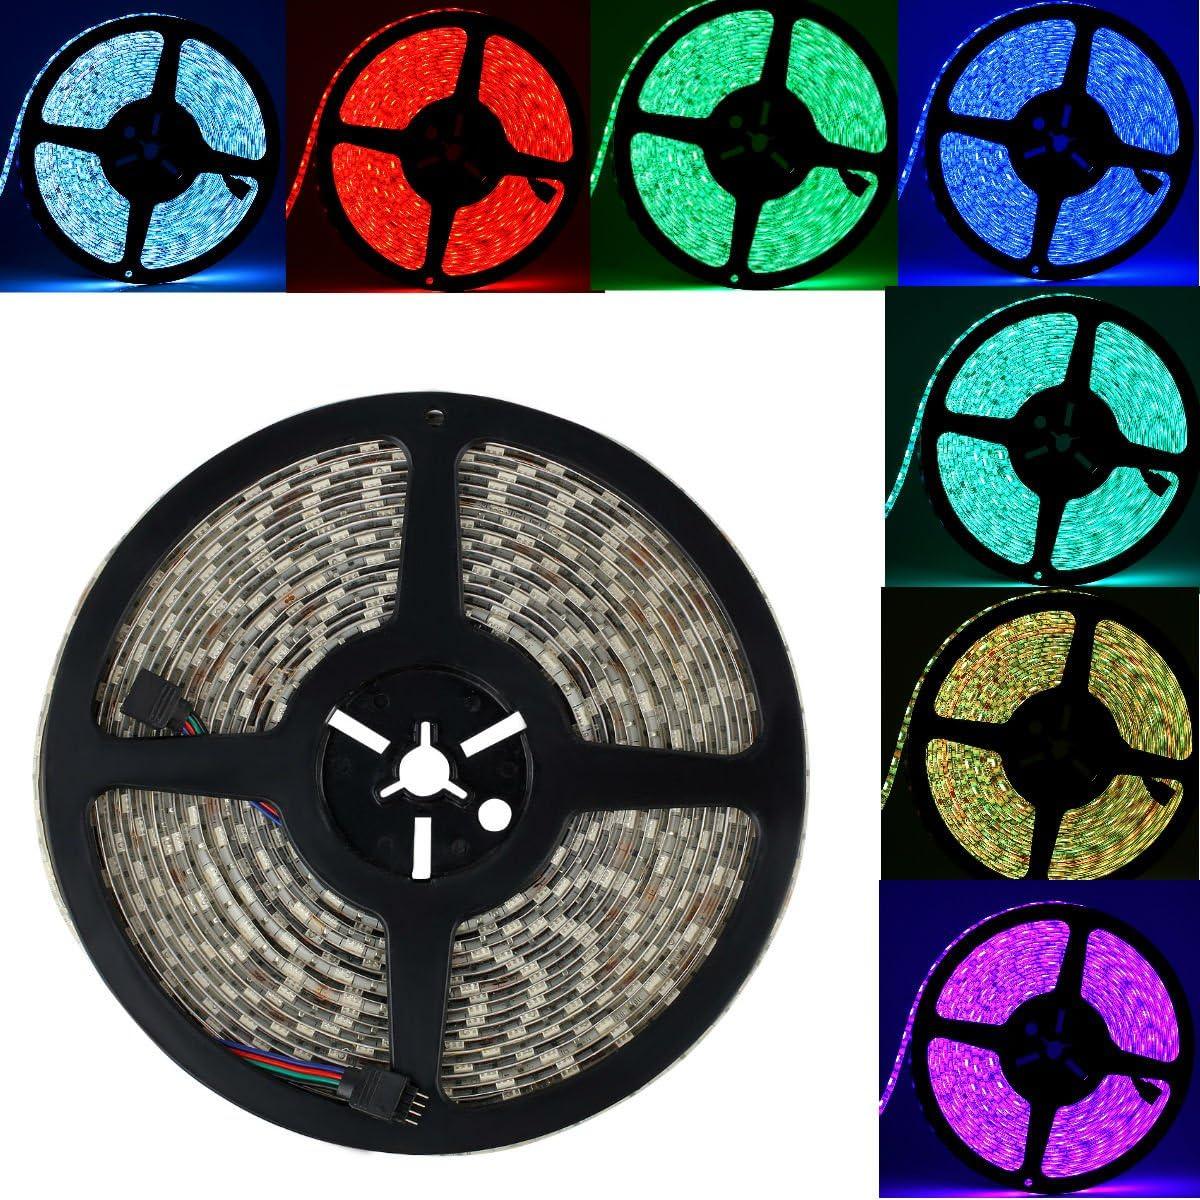 epbowpt RGB Tira LED 32.8ft/10m 24V RGB LED Strip SMD 5050IP65Resistente al Agua 600LEDs el Cambio de Color 60leds/m LED Banda Barra de luz (Solo un Listones de luz)